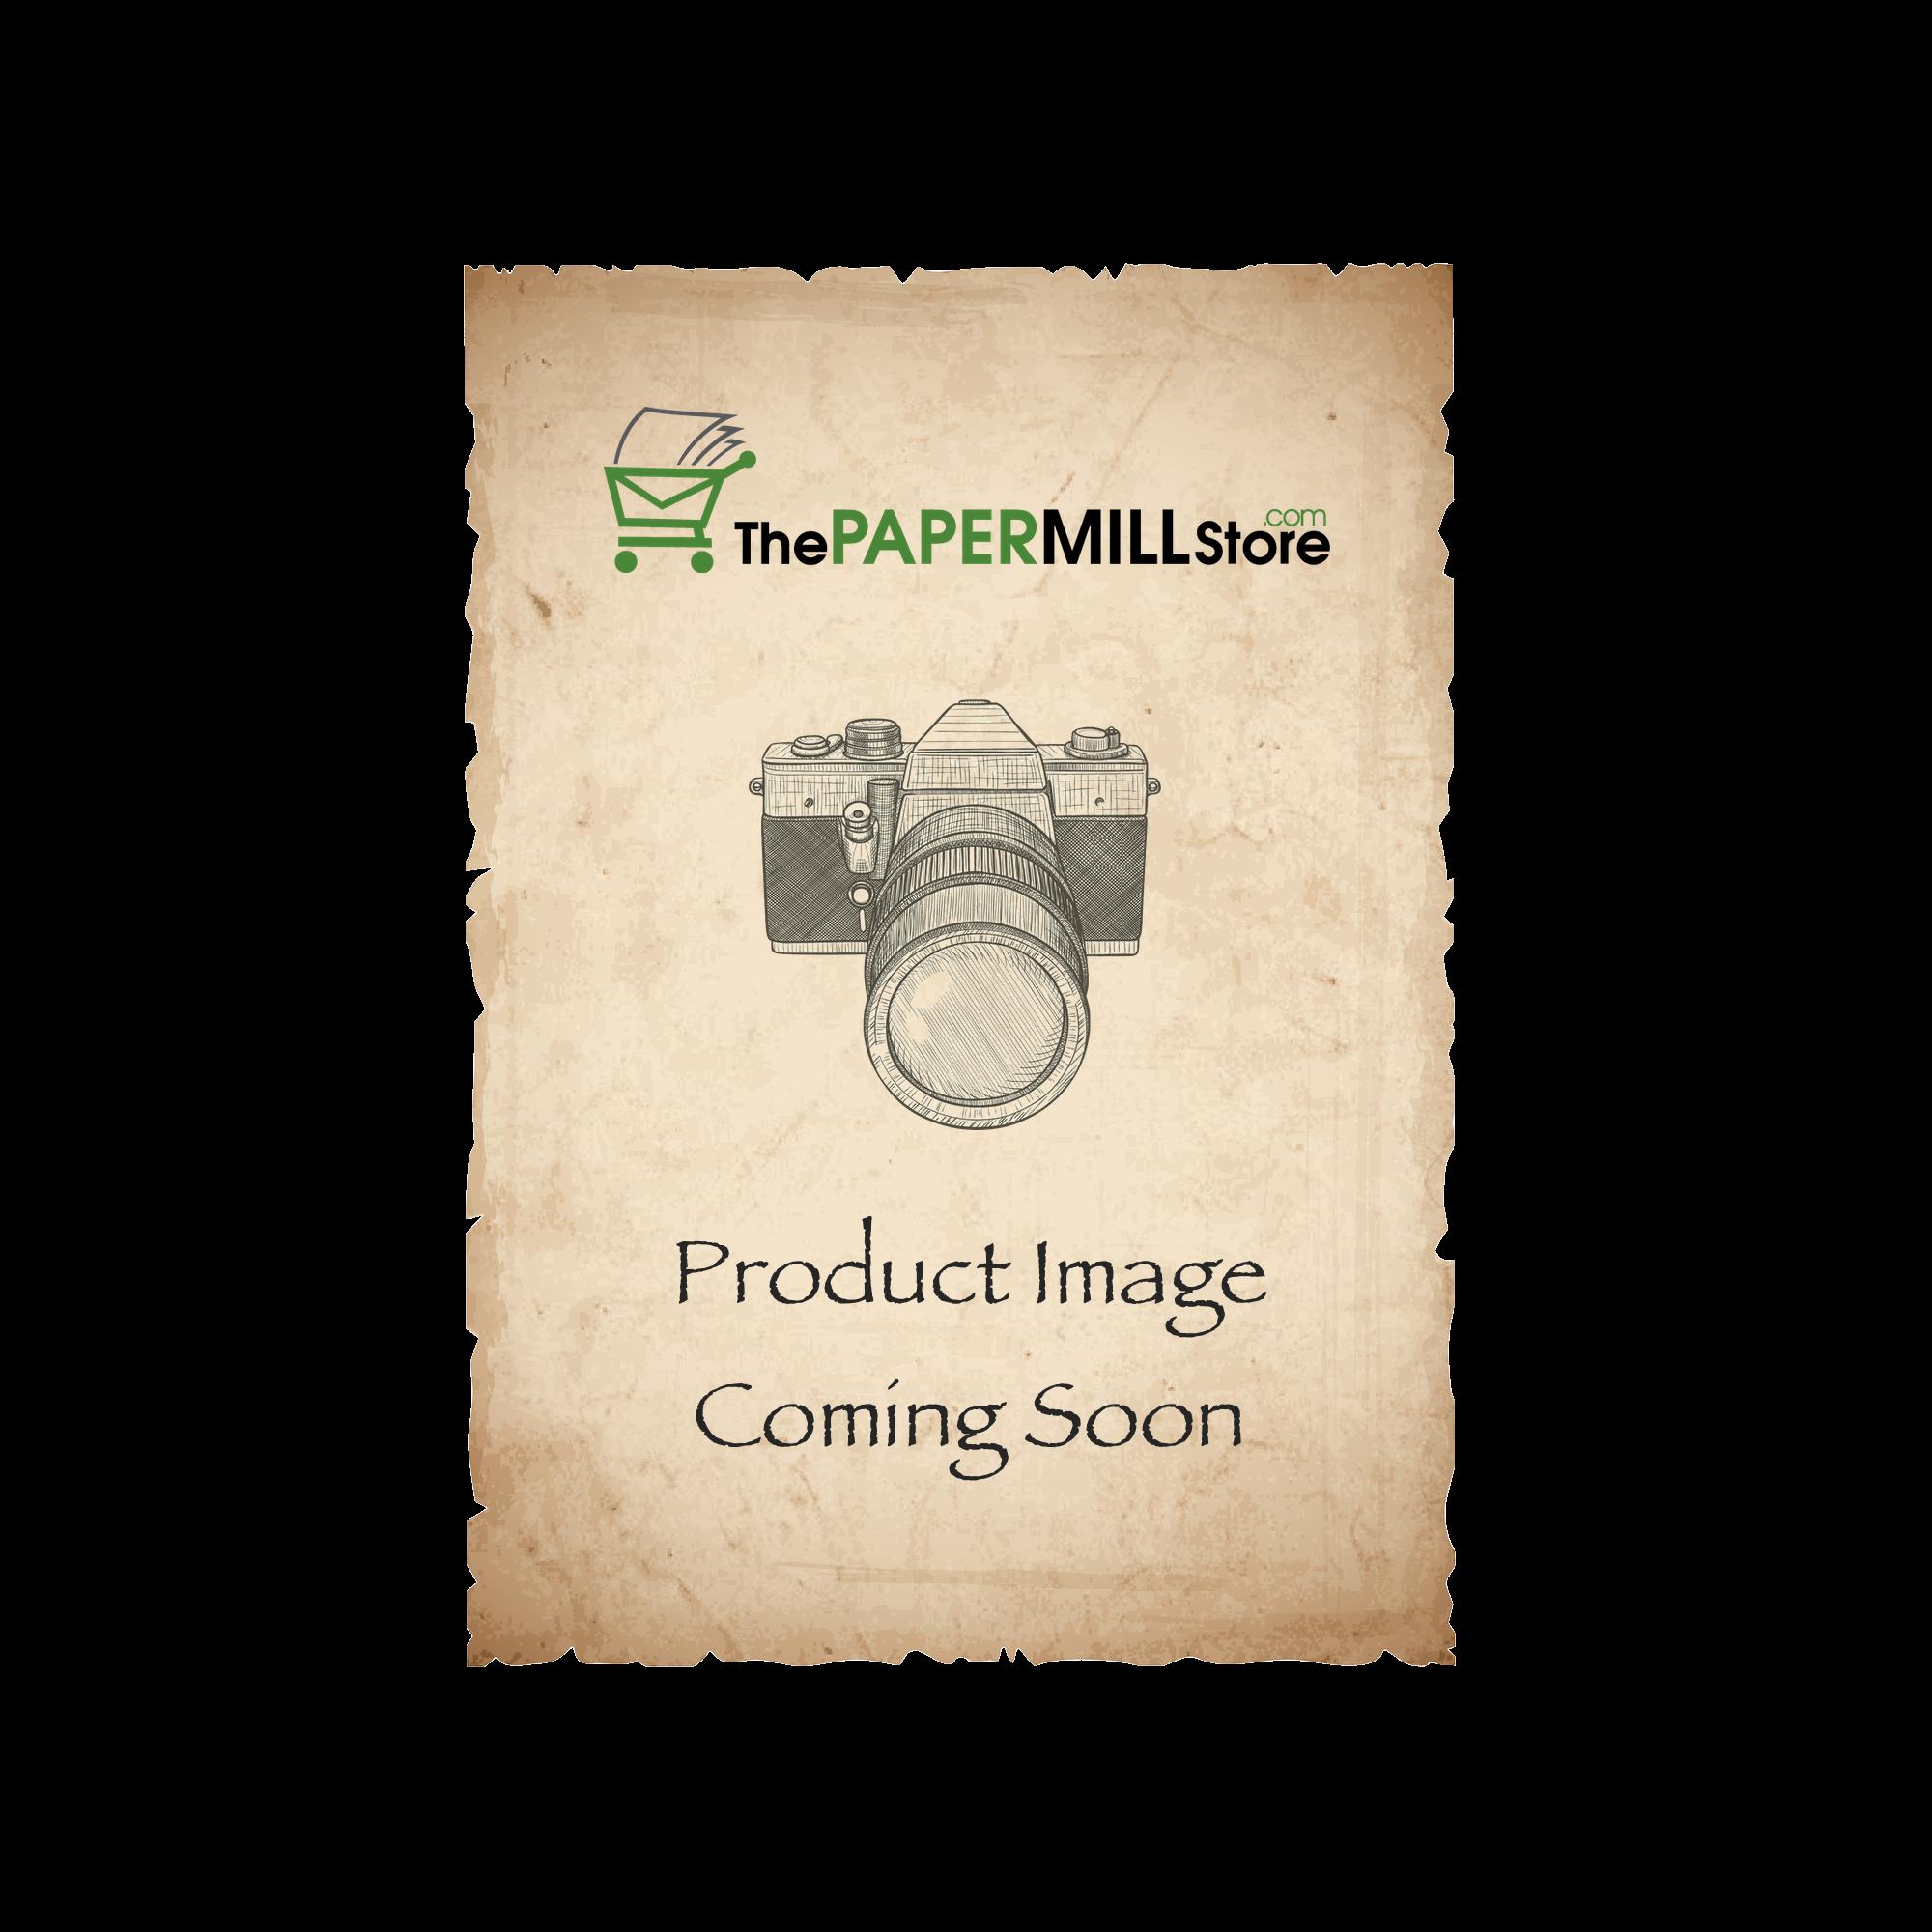 Buy Loop Feltmark Talc Card Stock - 26 x 40 in 110 lb Cover Feltmark  50% Recycled 300 per Carton at The Paper Mill Store .com